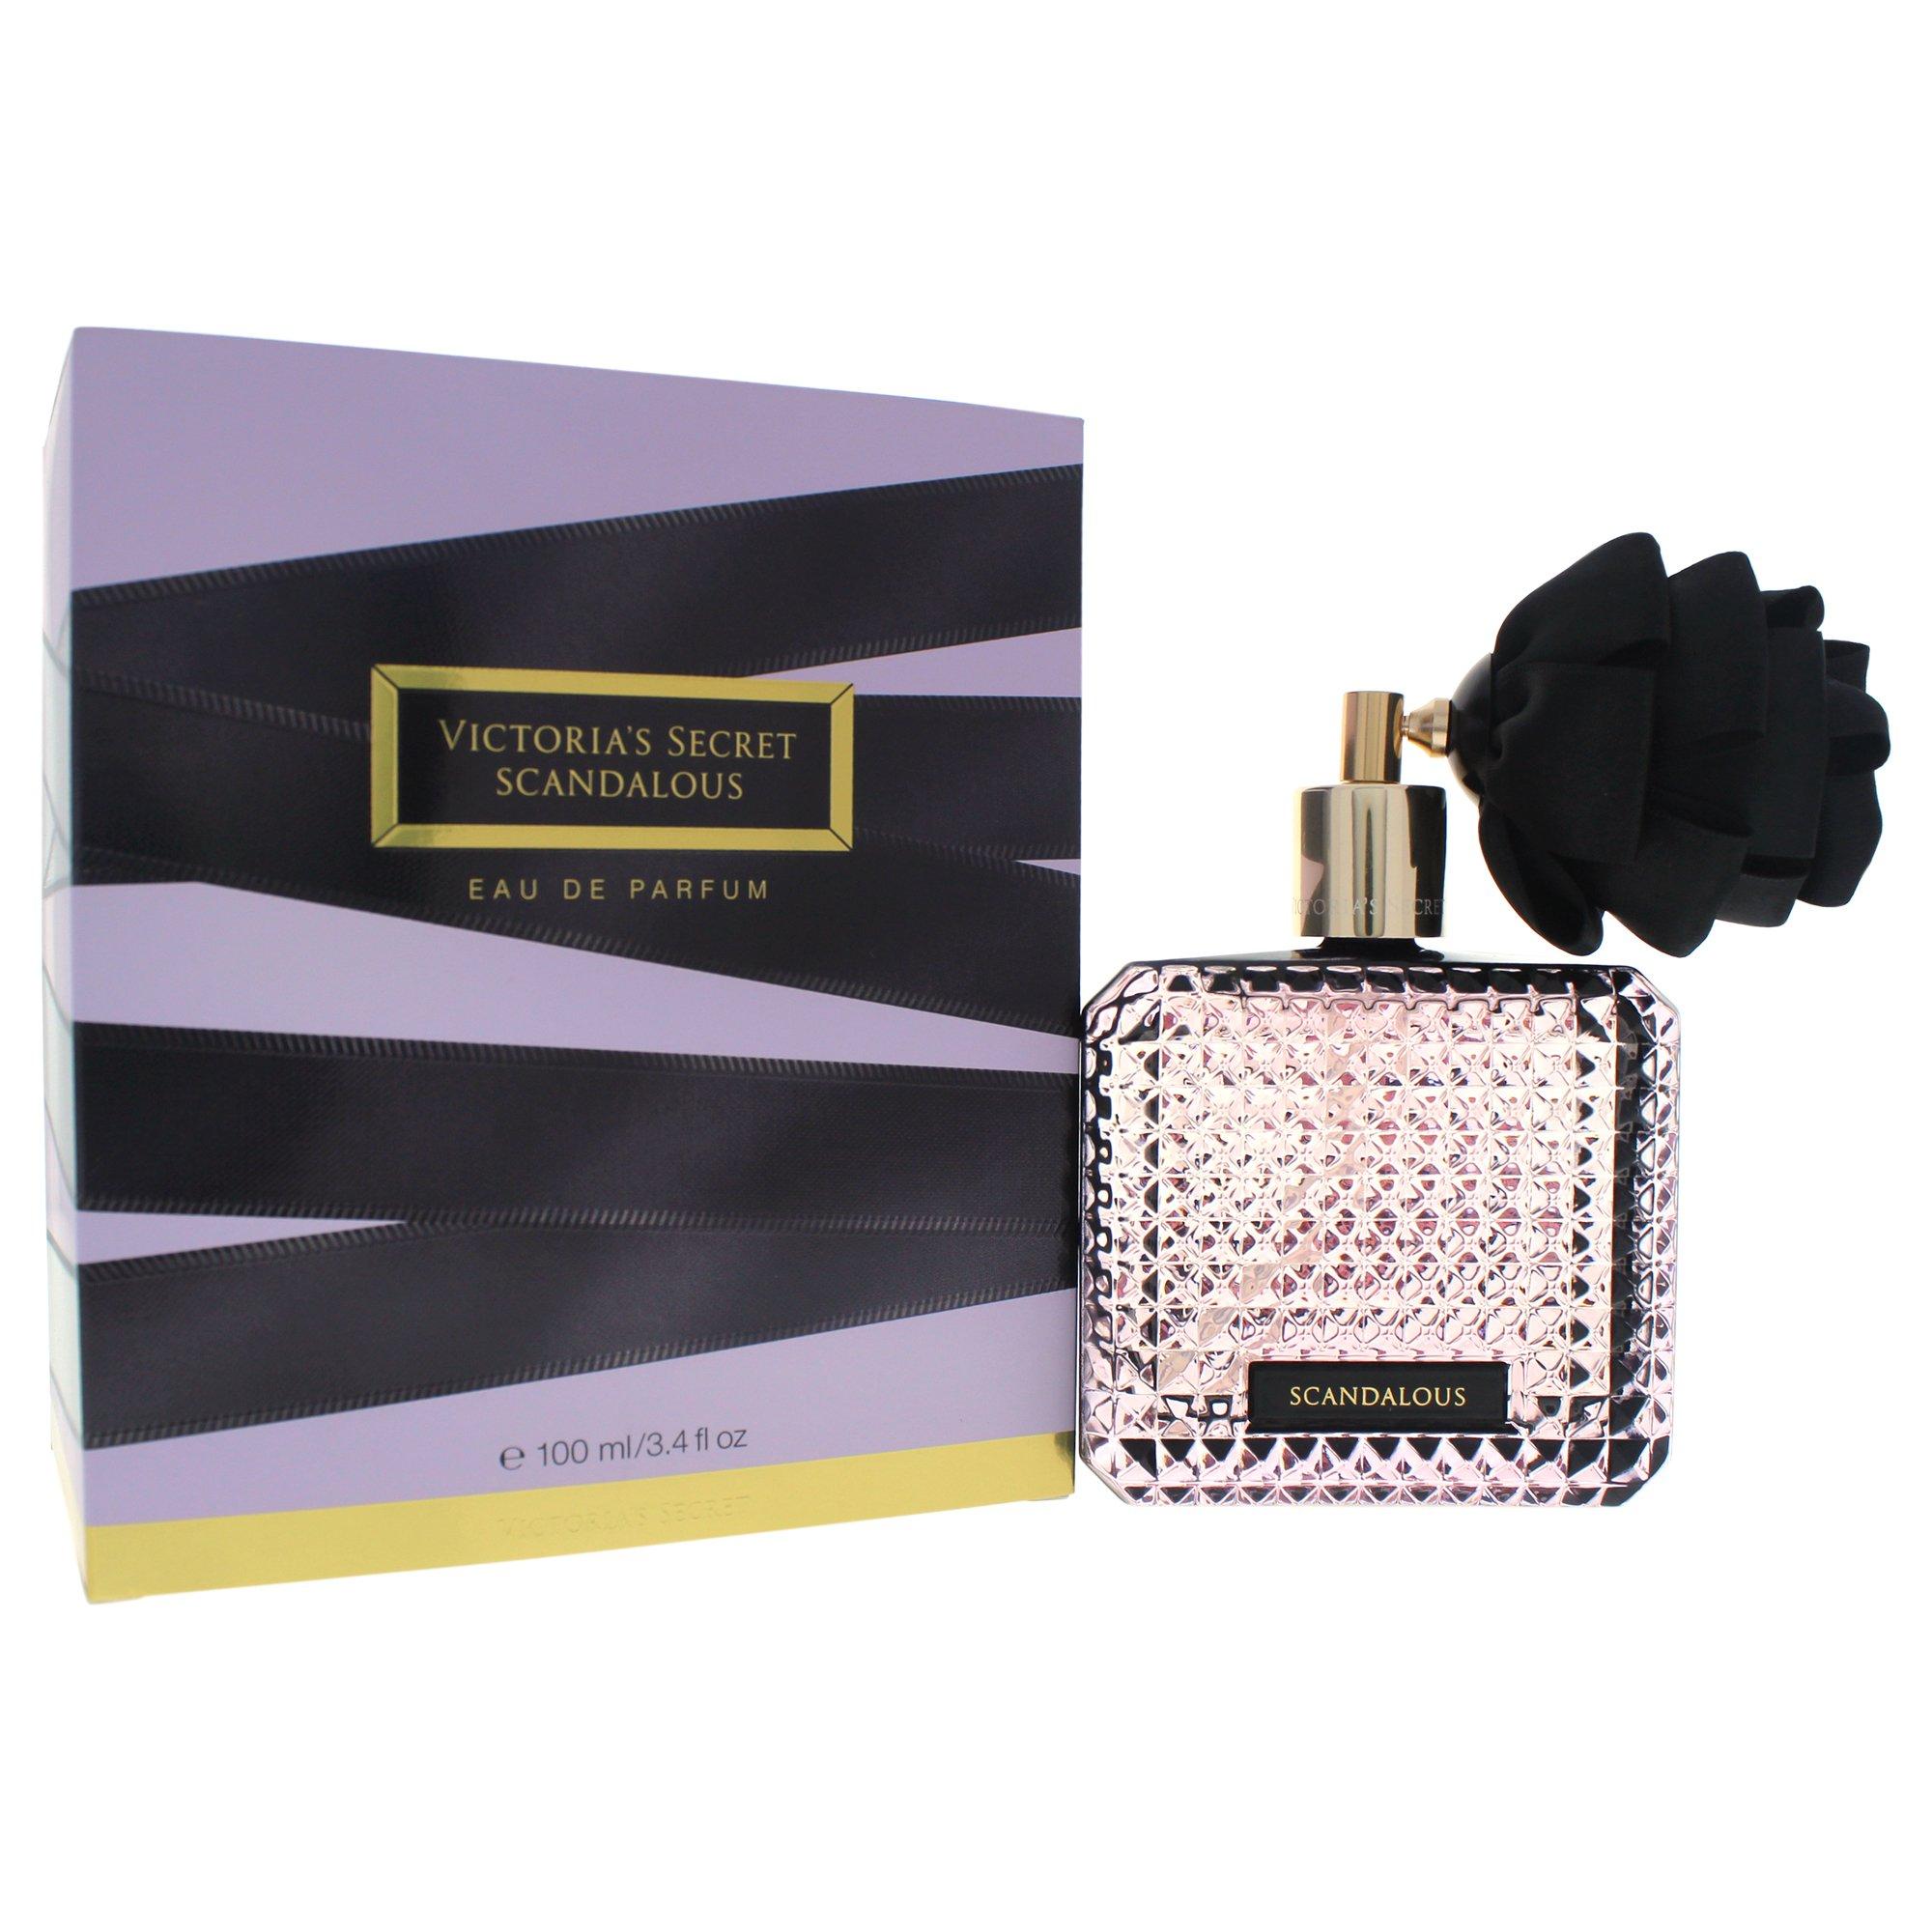 How To Make A Book Cover Out Of A Victoria S Secret Bag ~ Amazon.com : victorias secret scandalous eau de parfum spray 3.4